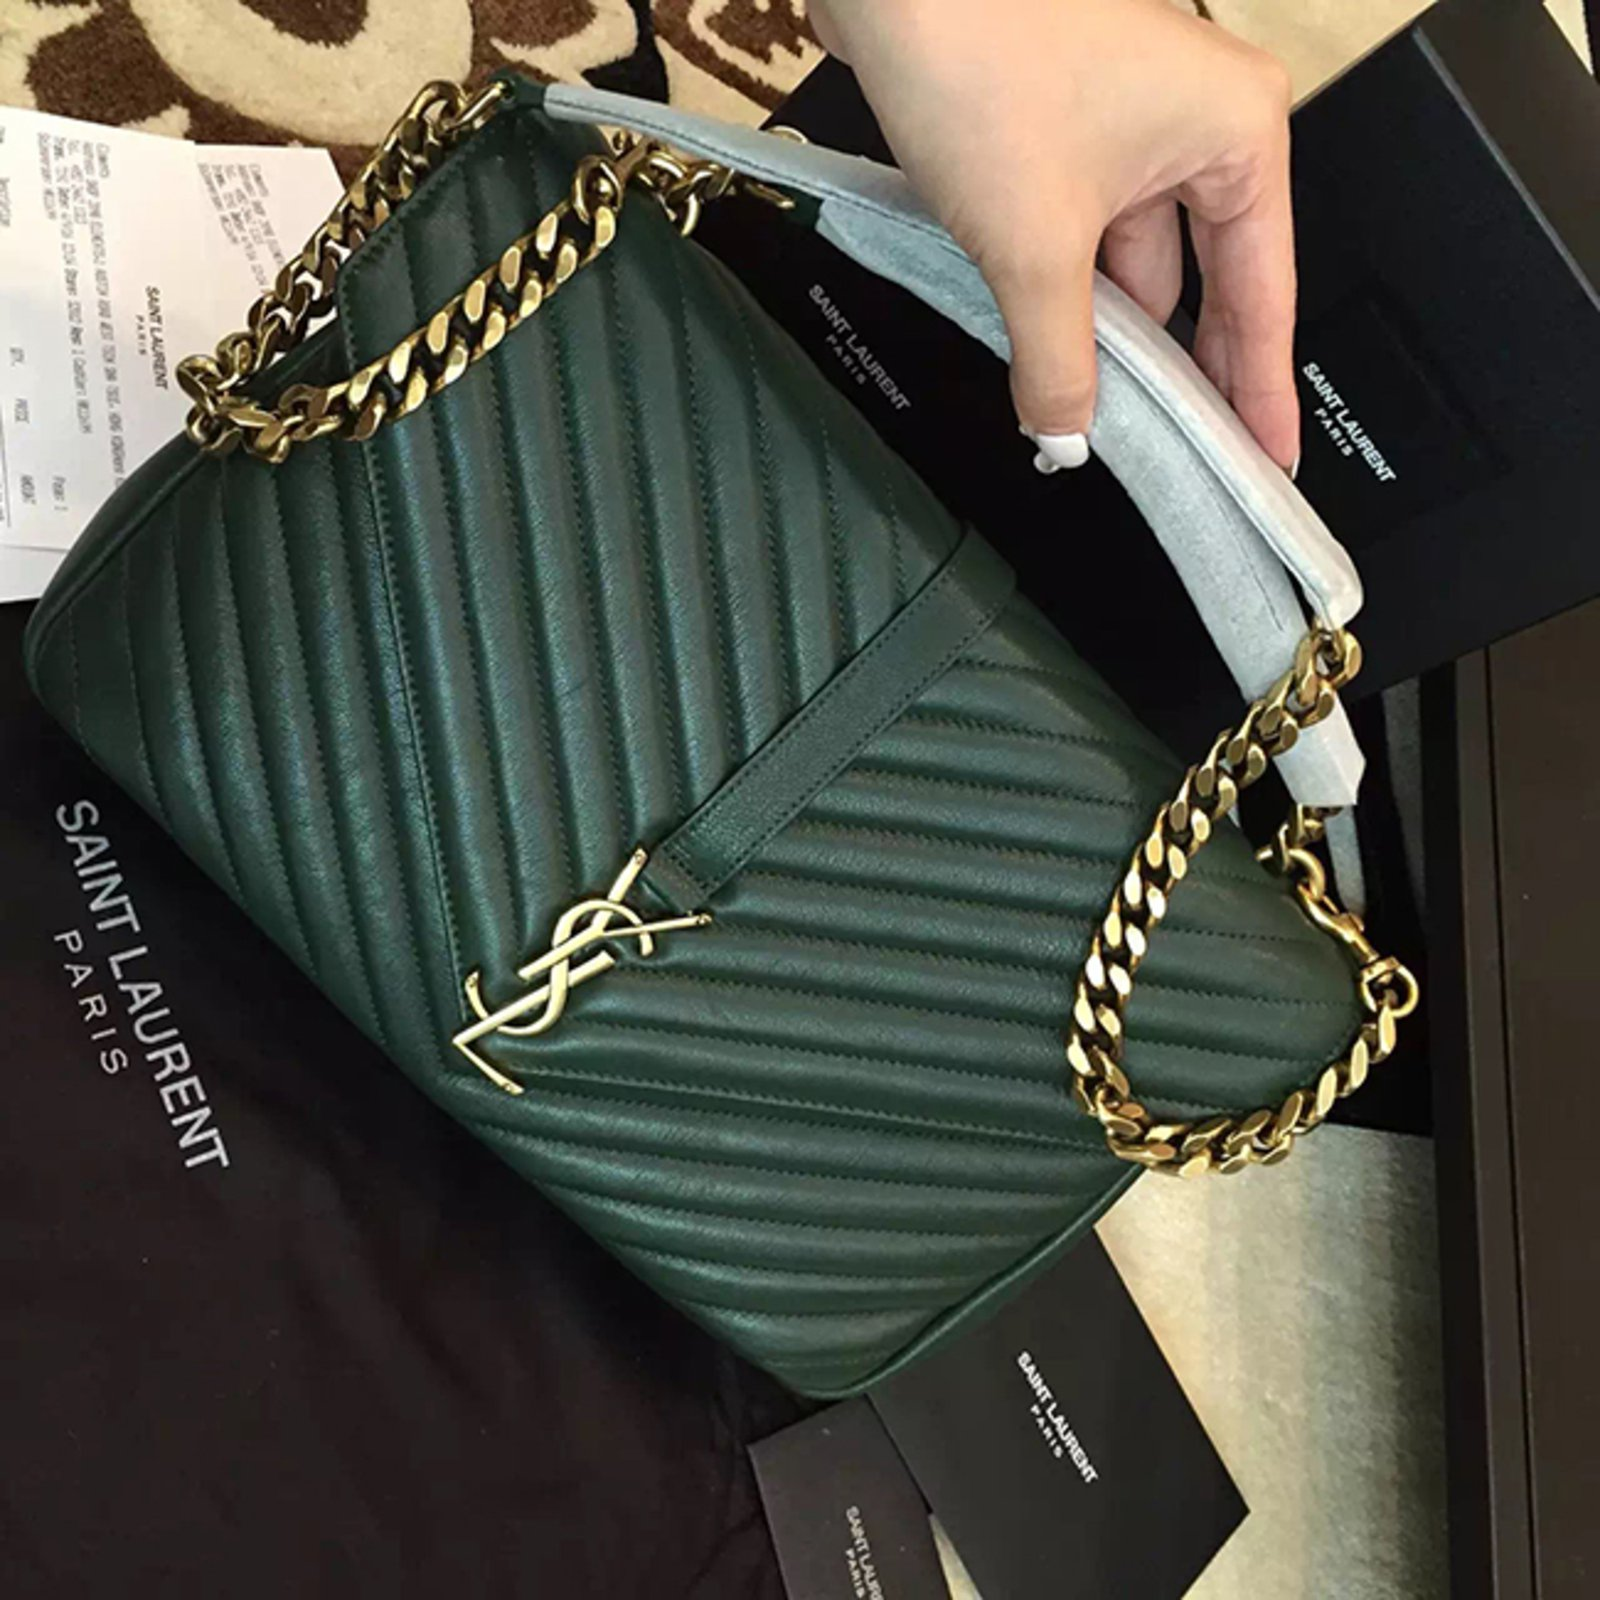 503186300b Yves Saint Laurent YSL green college chain shoulder bag medium Handbags  Leather Green ref.57110 - Joli Closet